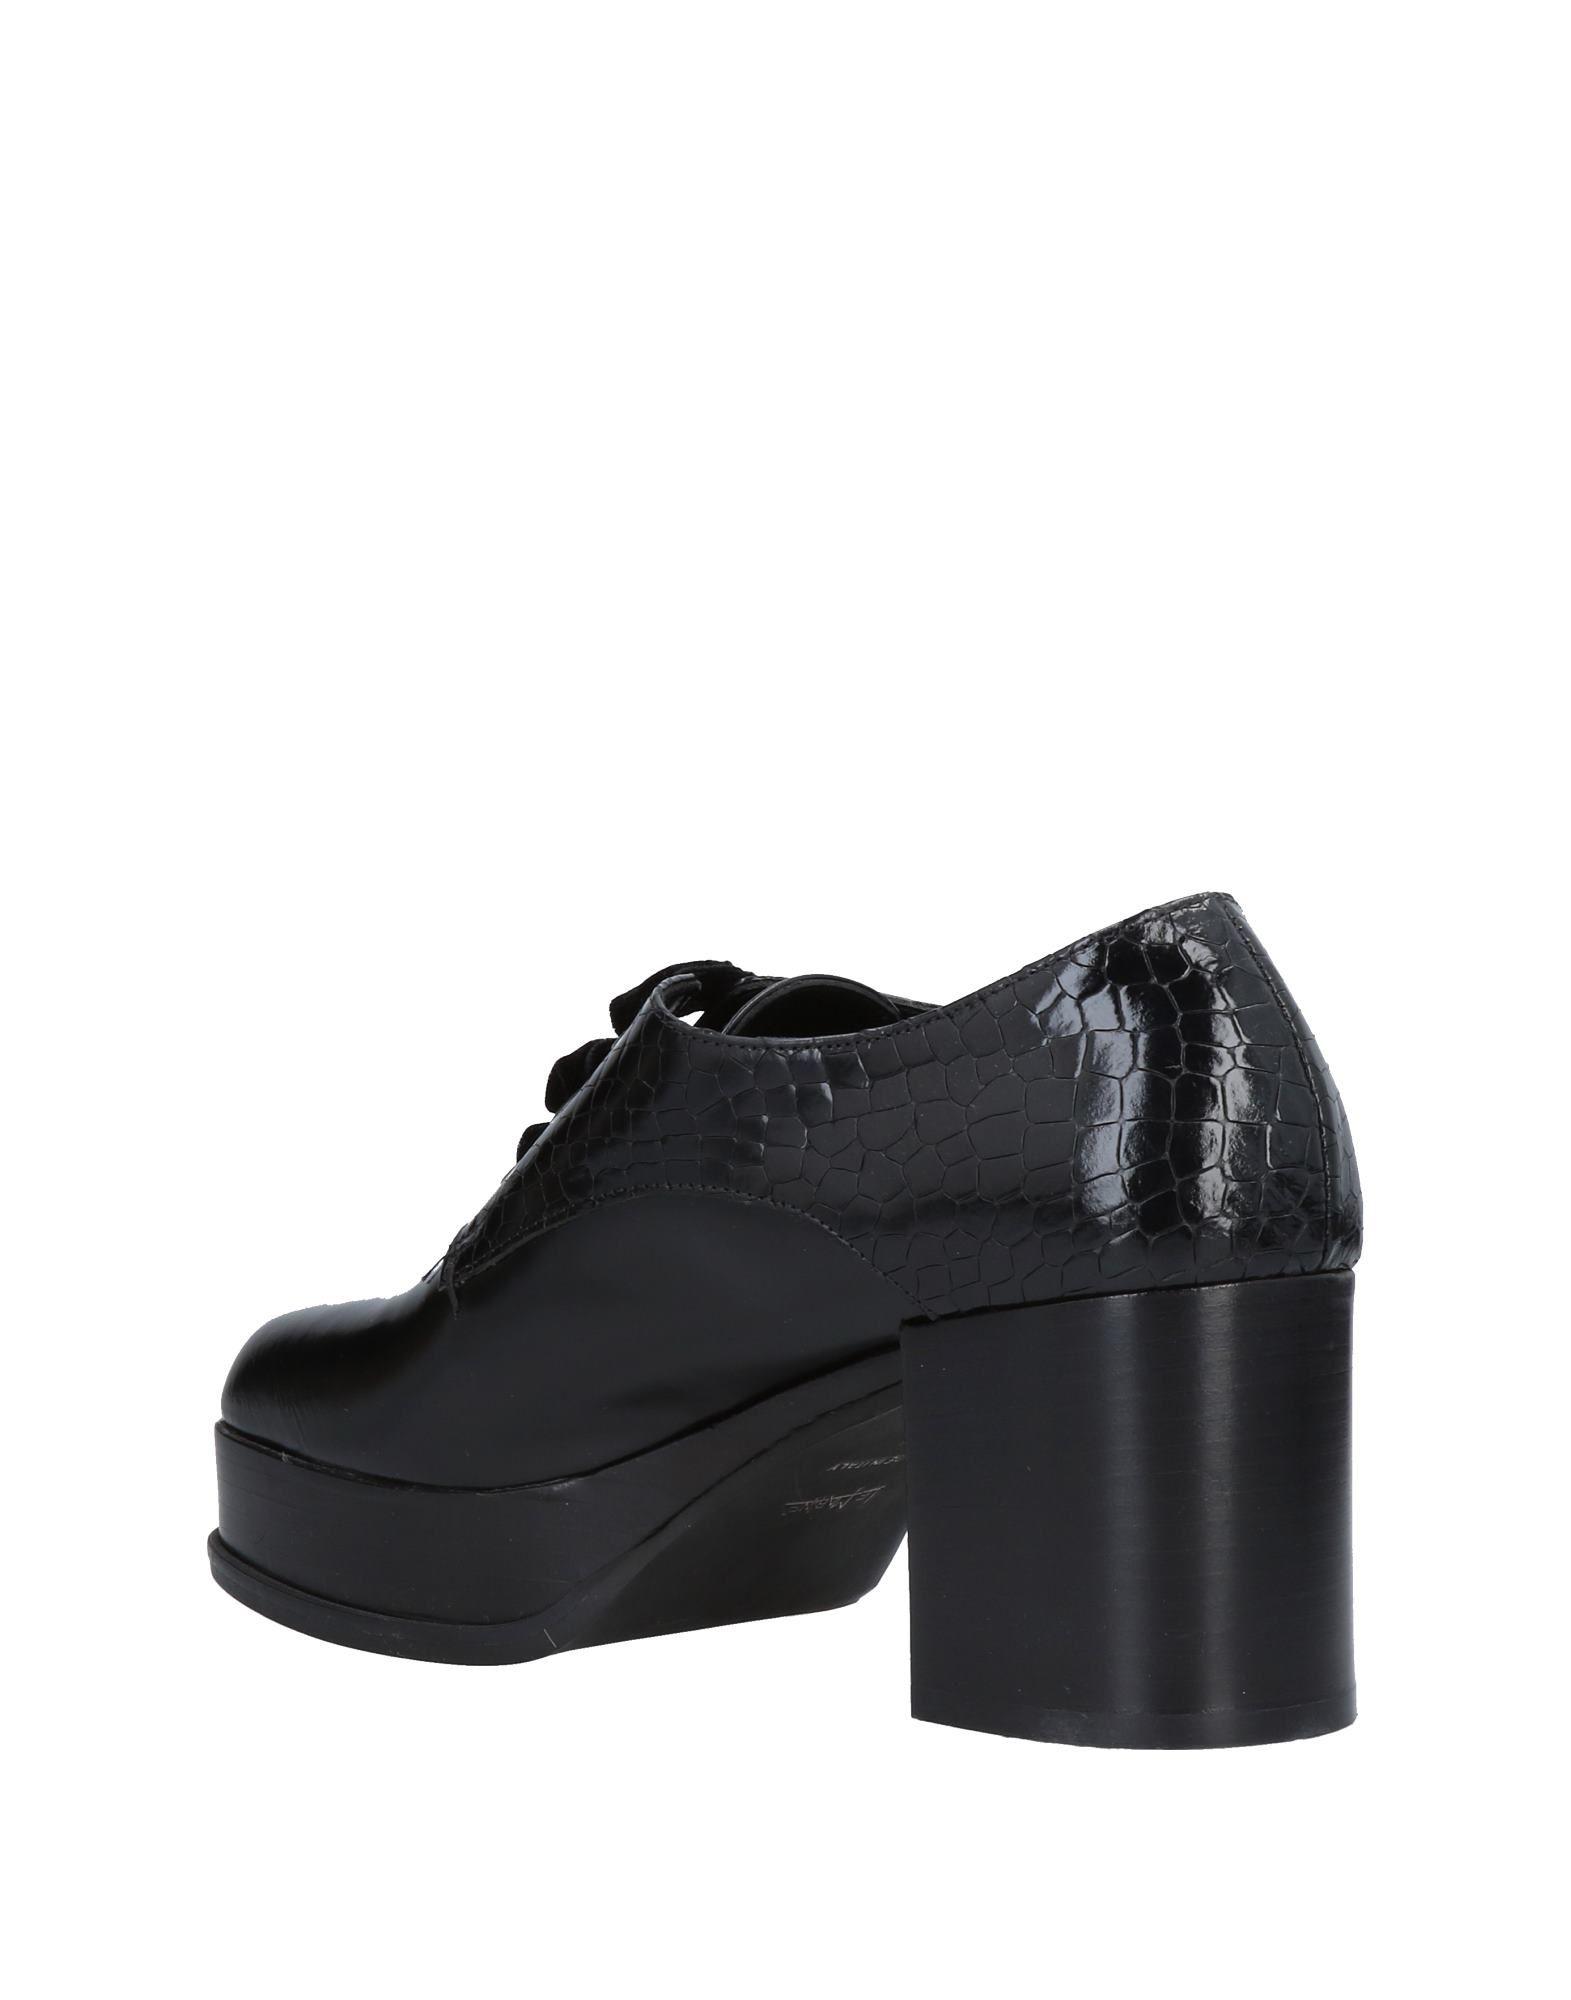 Gut Marinē um billige Schuhe zu tragenLe Marinē Gut Schnürschuhe Damen  11486006MM 6b27cc